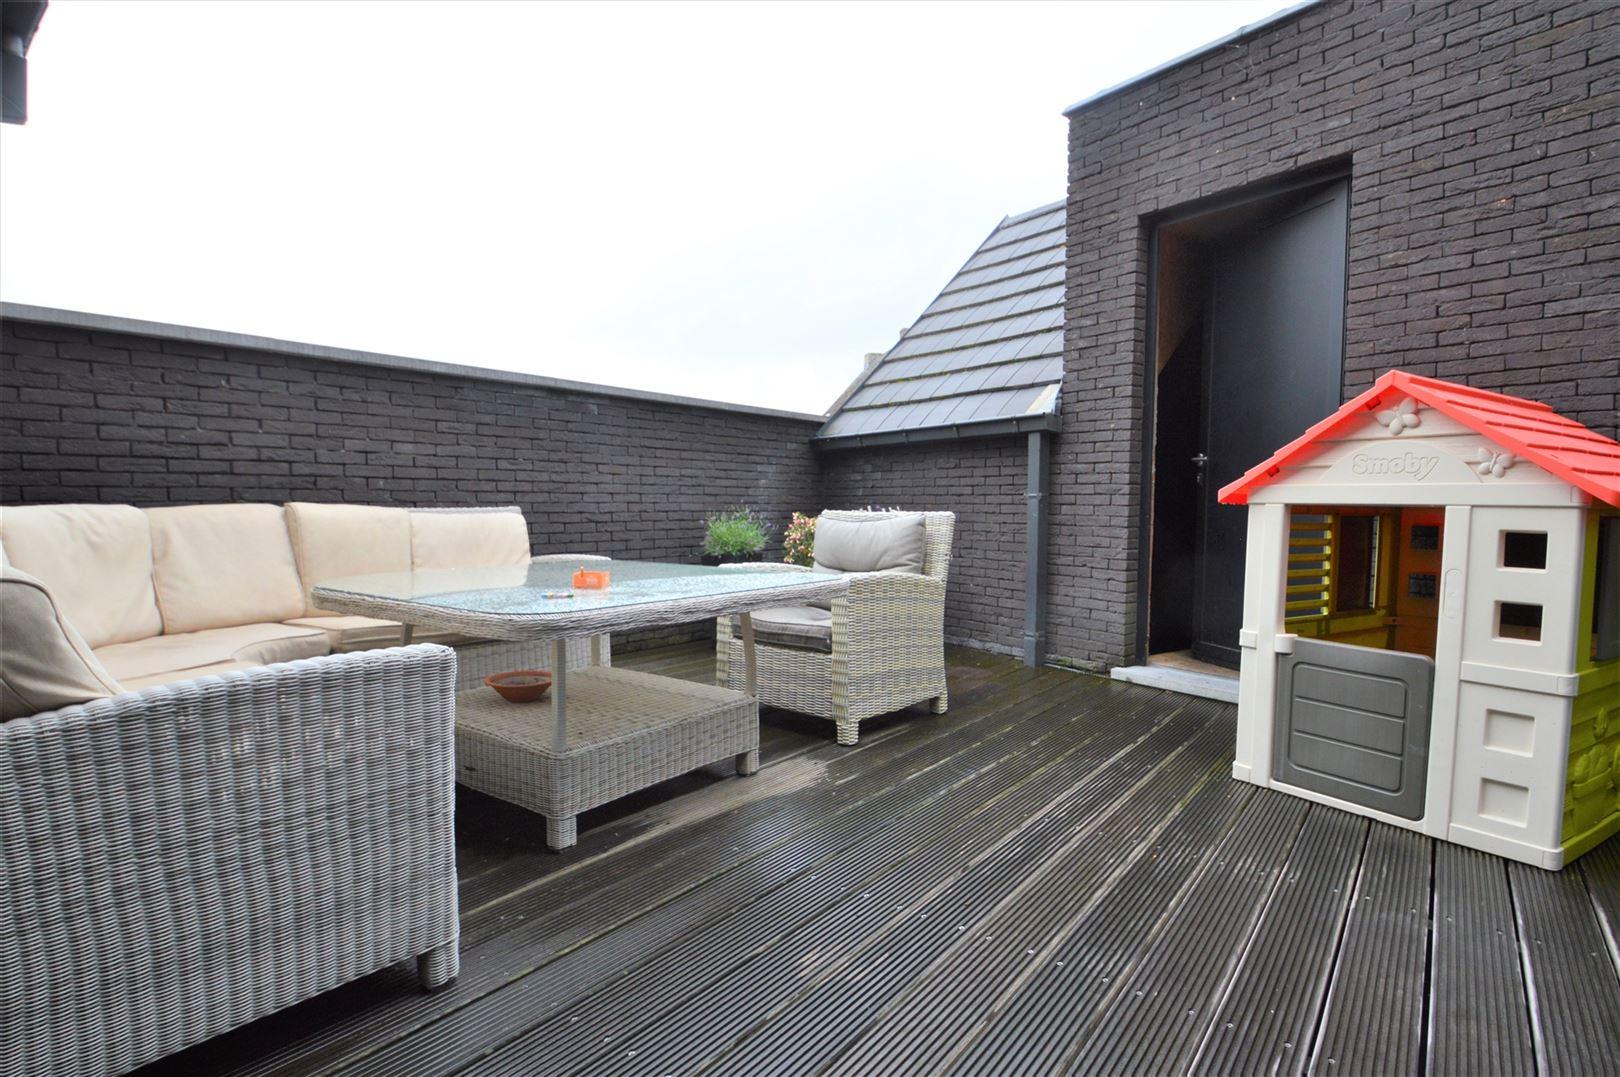 Foto 10 : Appartement te 9200 BAASRODE (België) - Prijs € 750